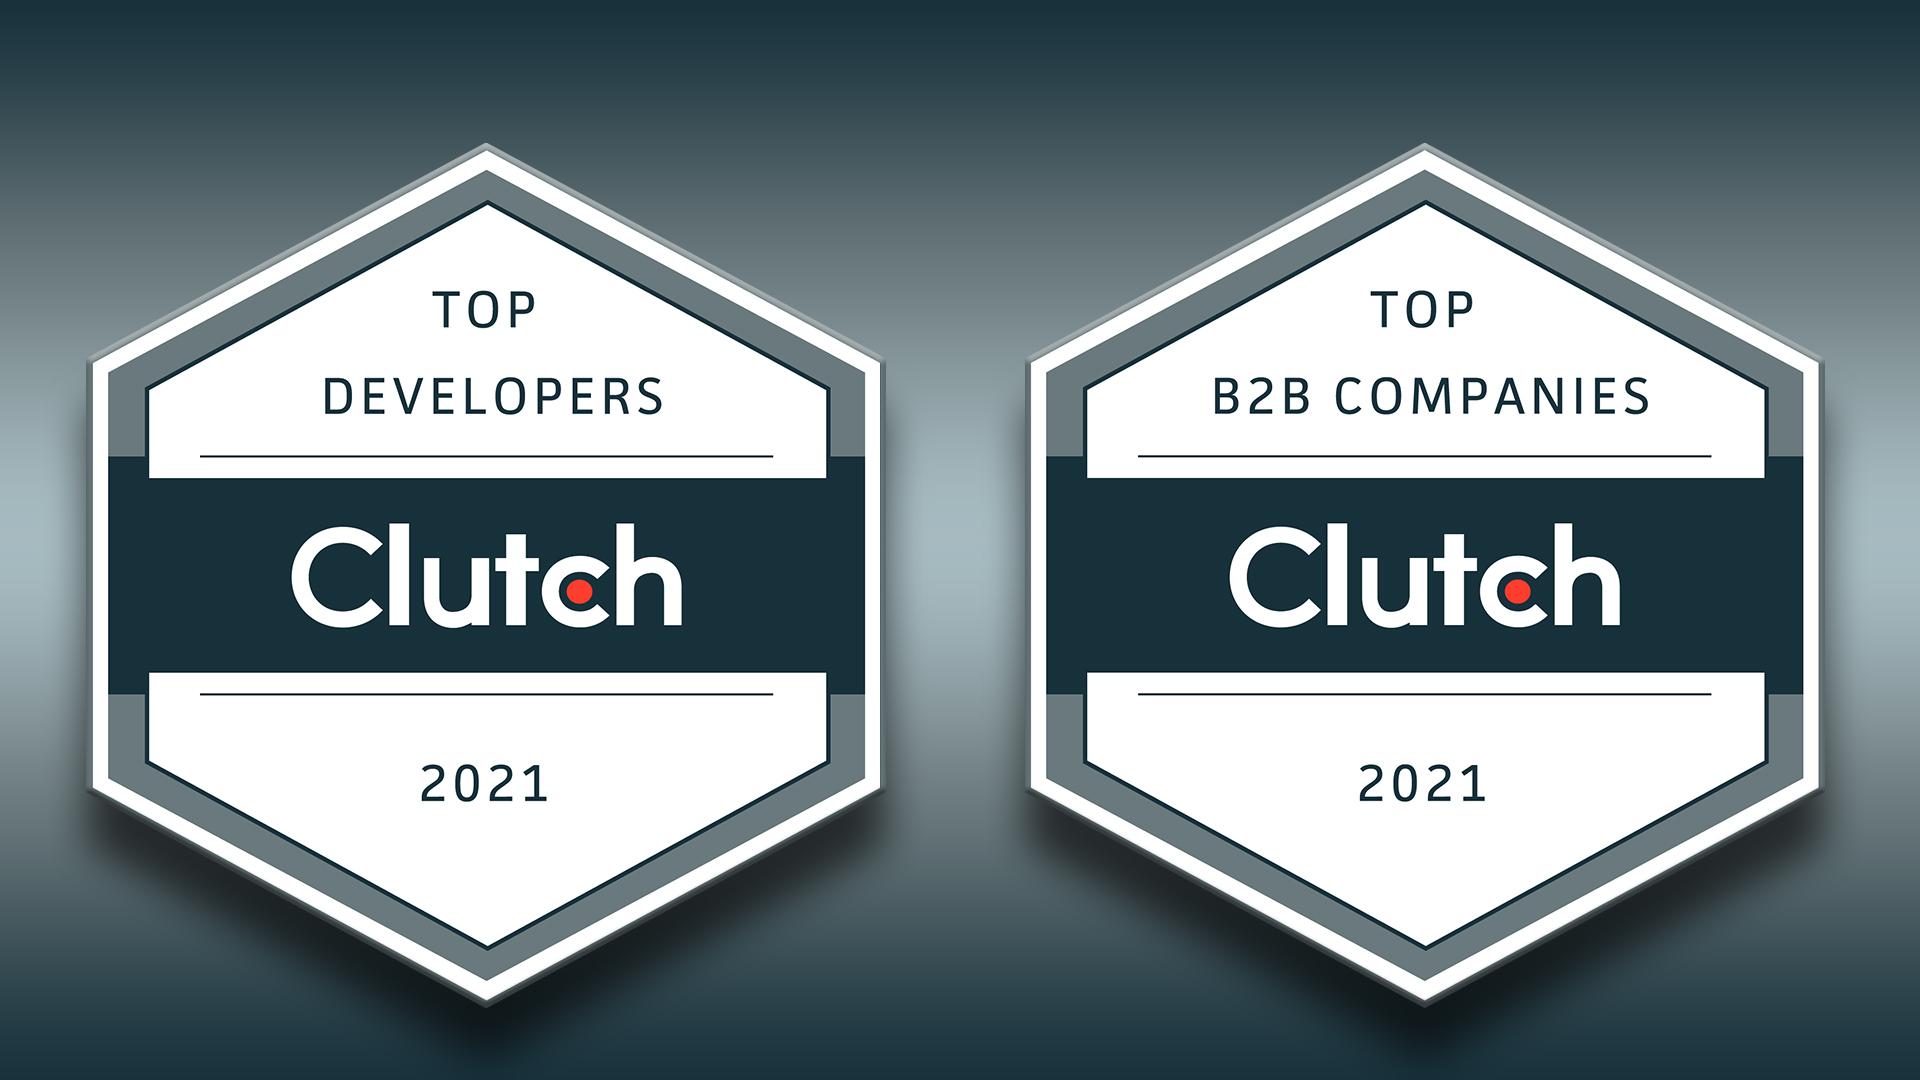 Clutch 2021 Leader Awards: CODE/+/TRUST Named as a Top Software Developer &B2B Provider in South Carolina